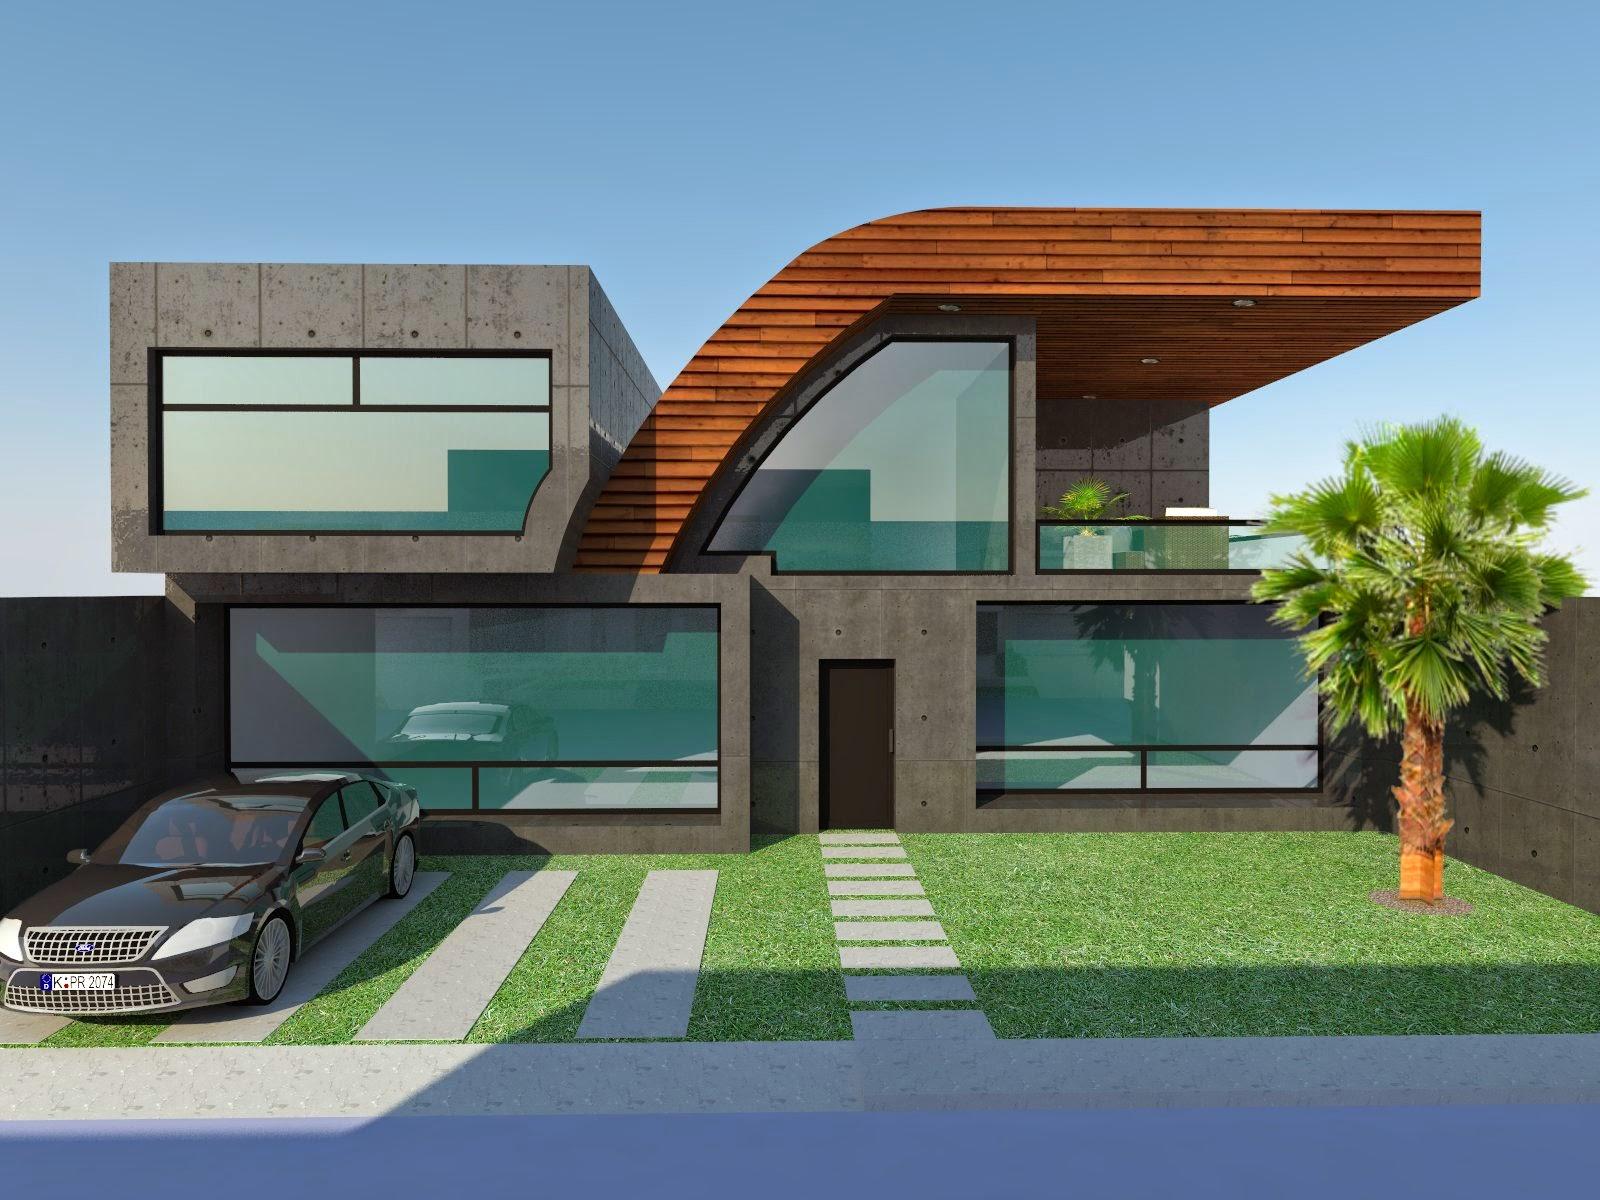 Arquitrec fachadas de casas minimalistas creadas en arquitrec for Casa minimalistas